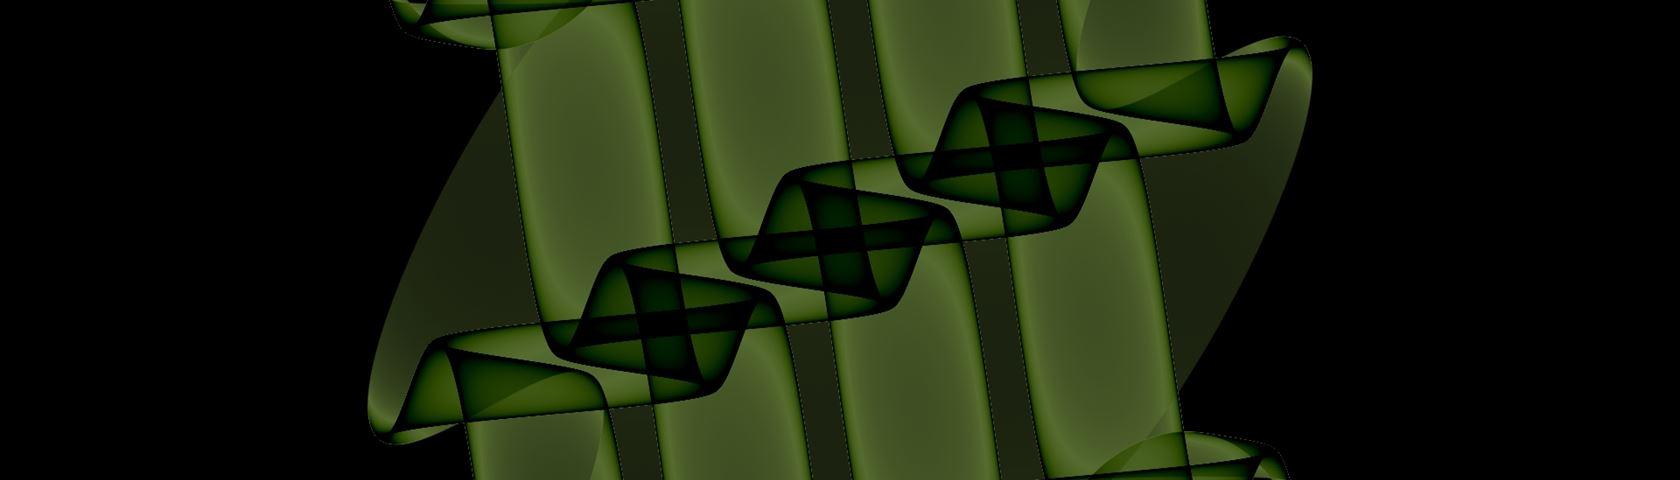 Green Wrapper